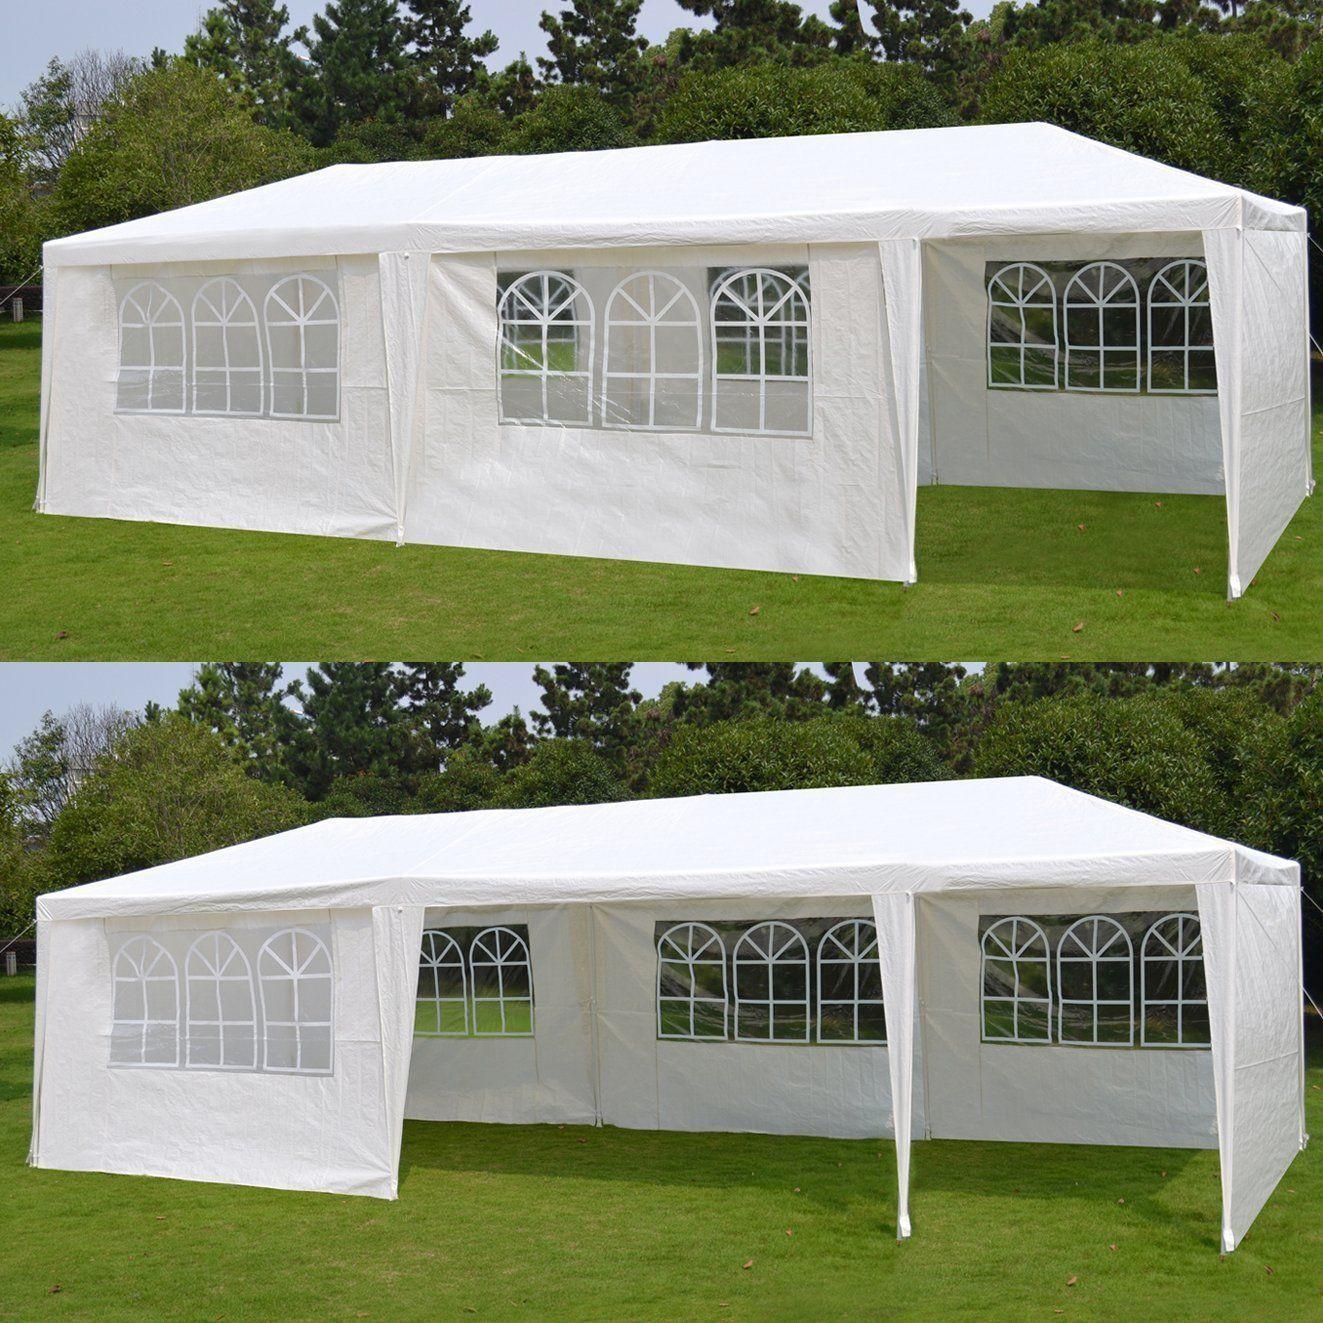 10'x 30' White Gazebo Yard Party Tent Canopy